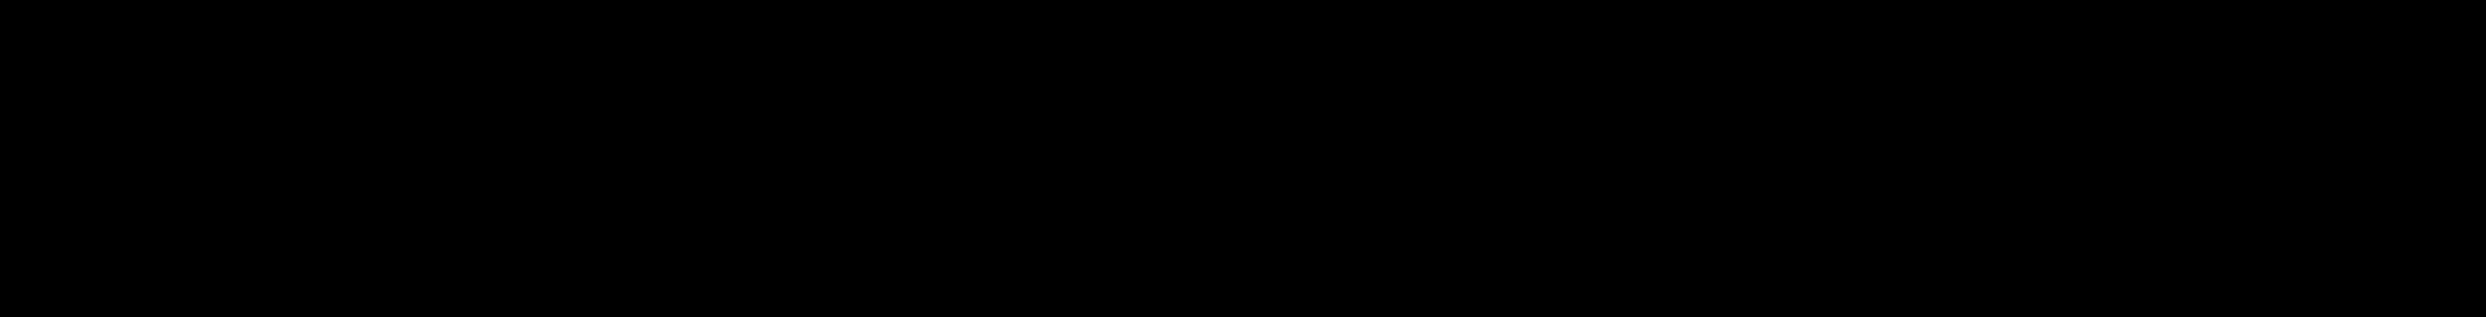 Lowblaw Digital logo